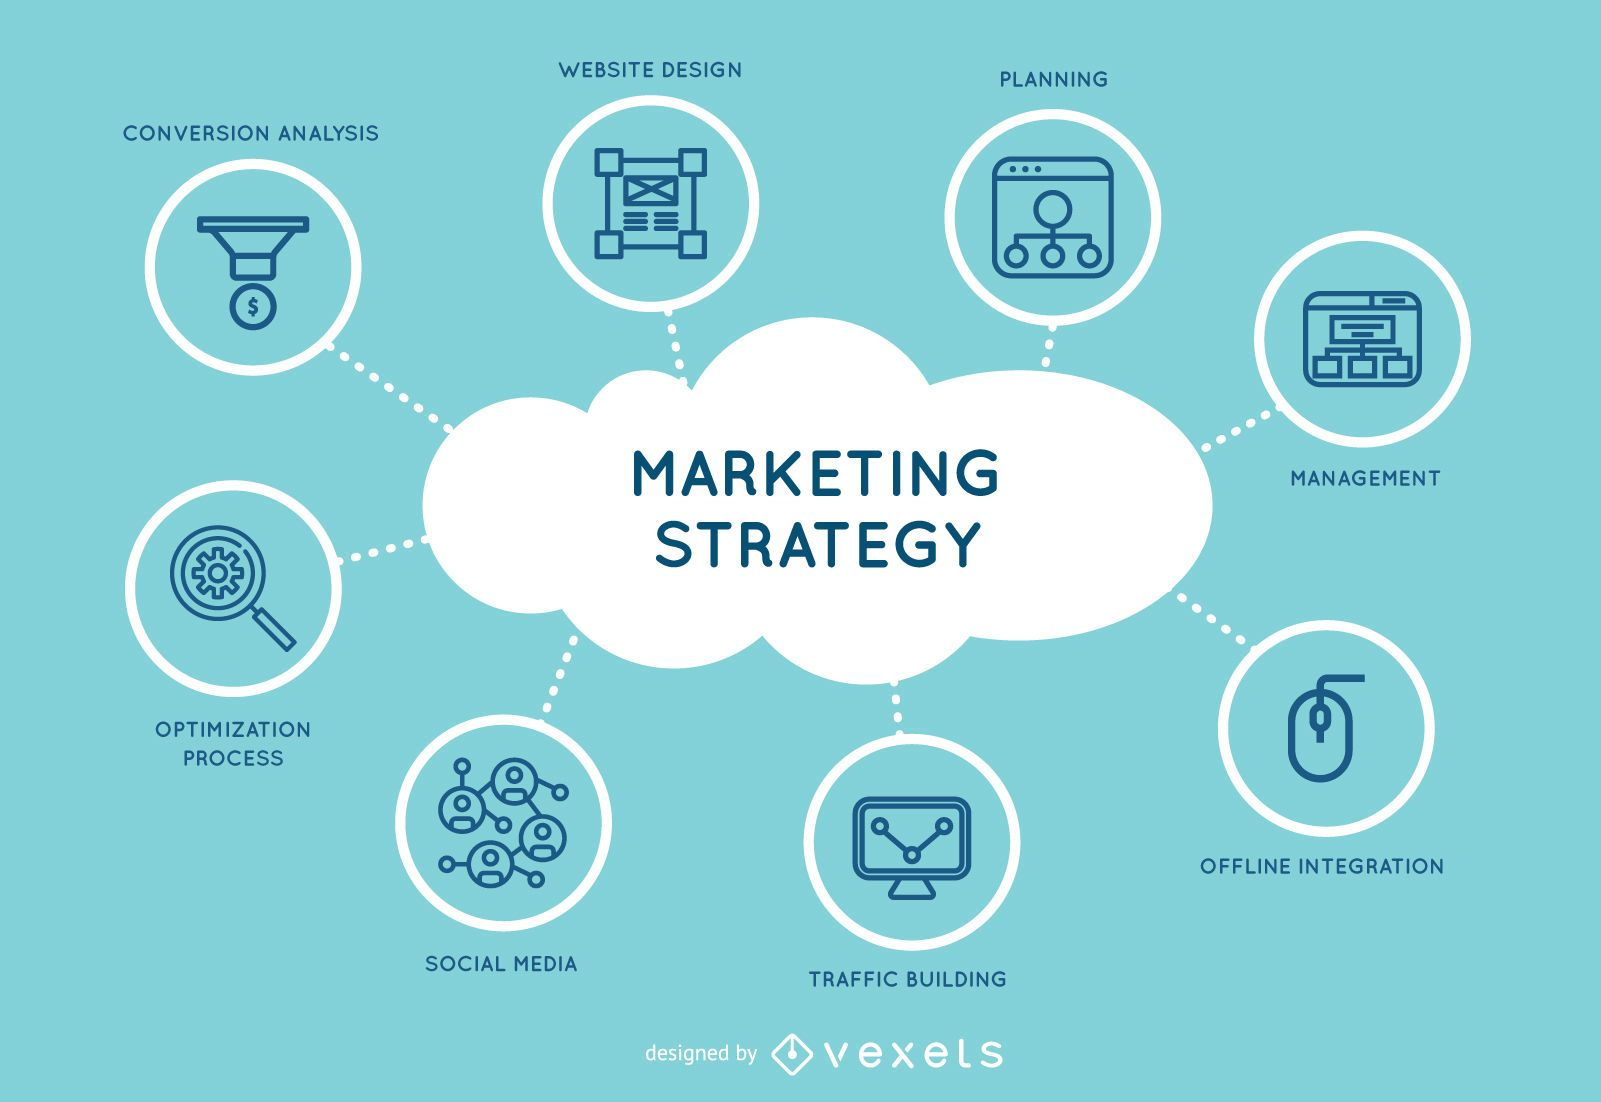 Marketing strategy design